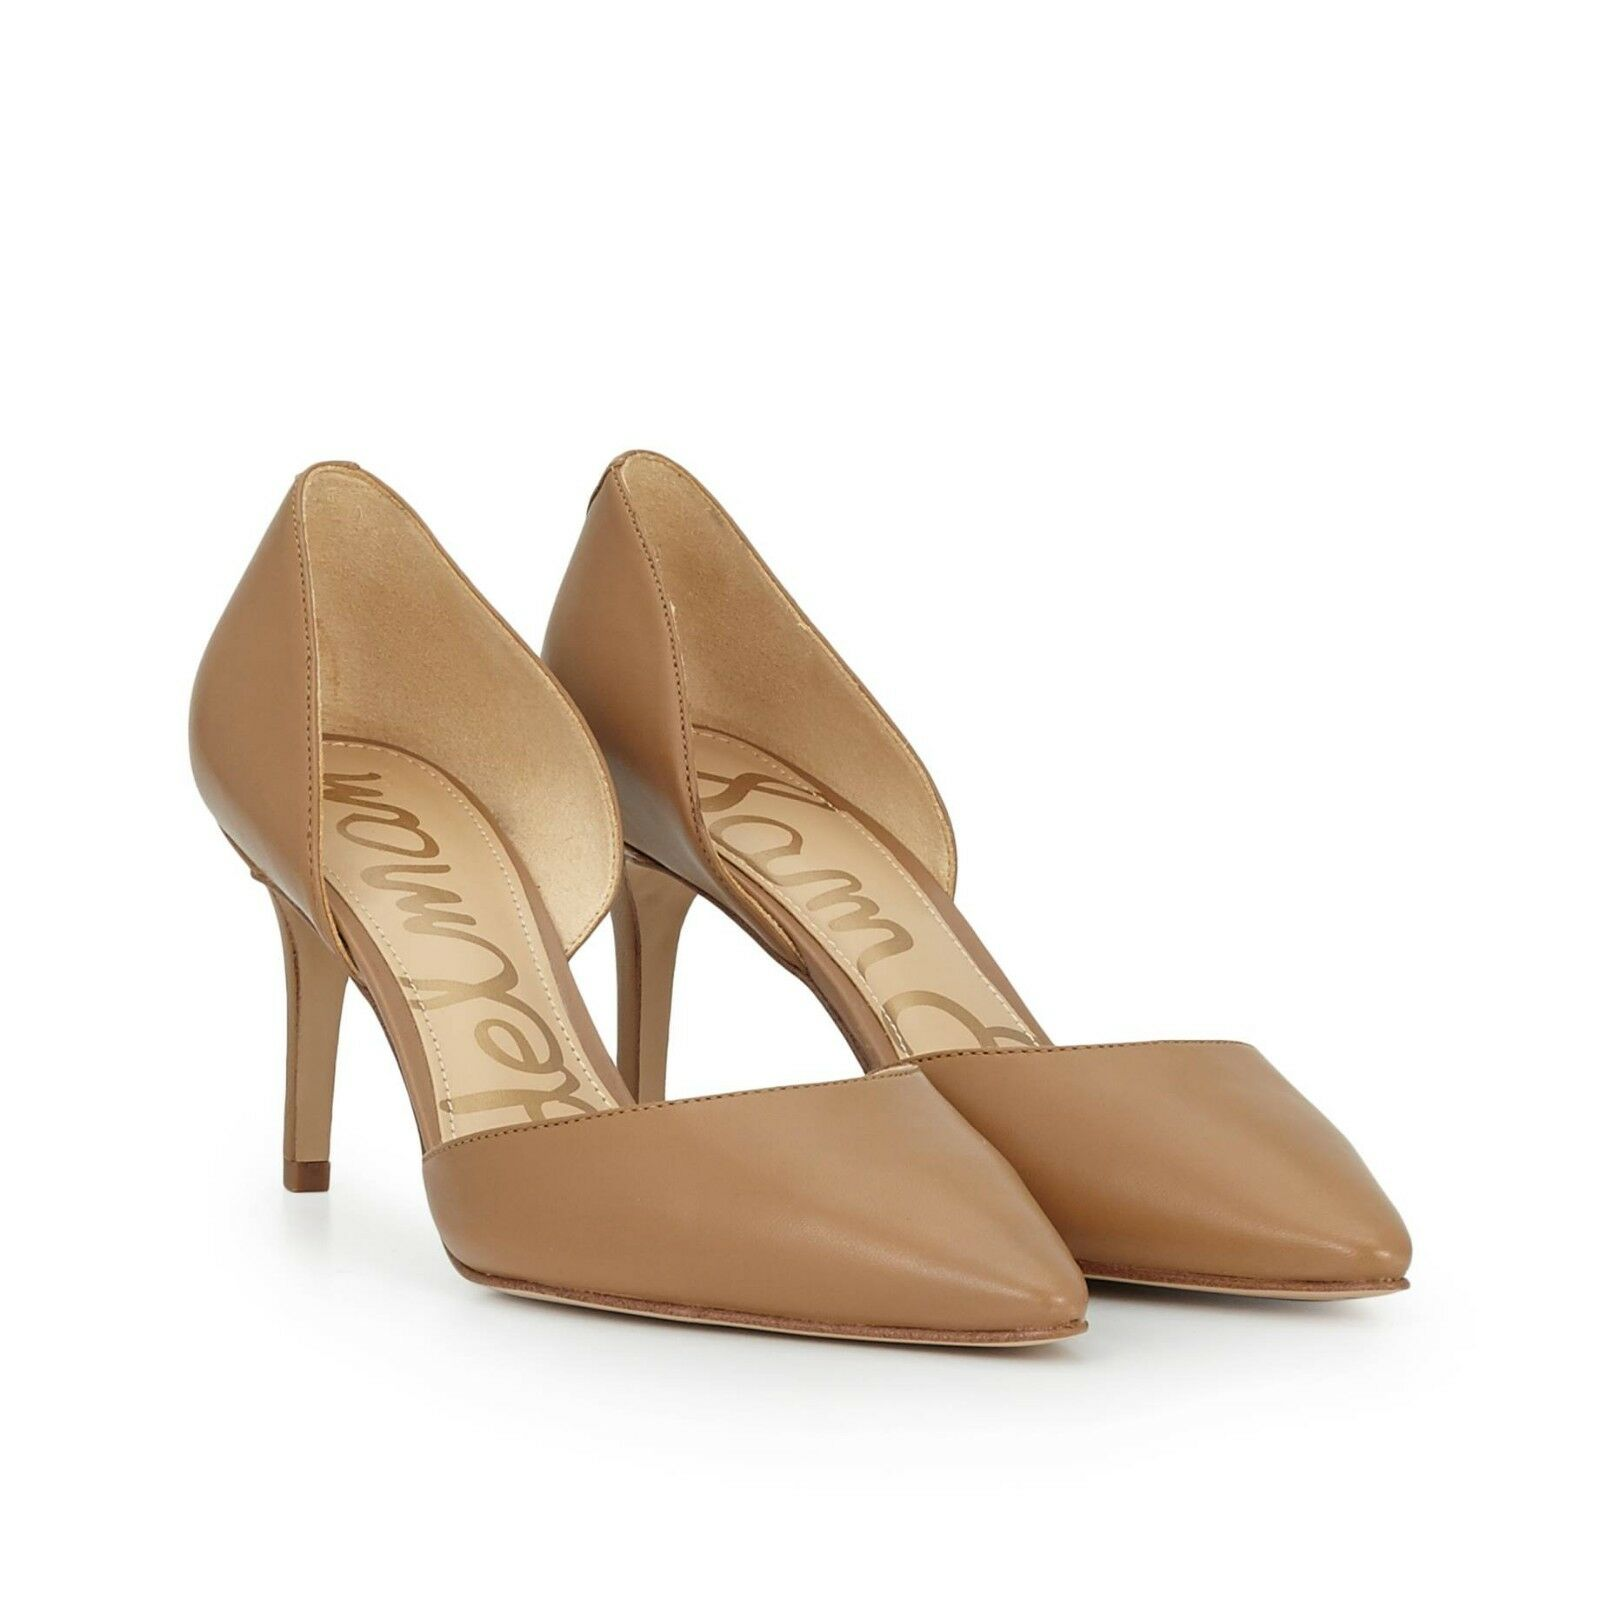 Sam Edelman TELSA D'Orsay Leather Point Toe Pump shoes Caramel 13 New  120